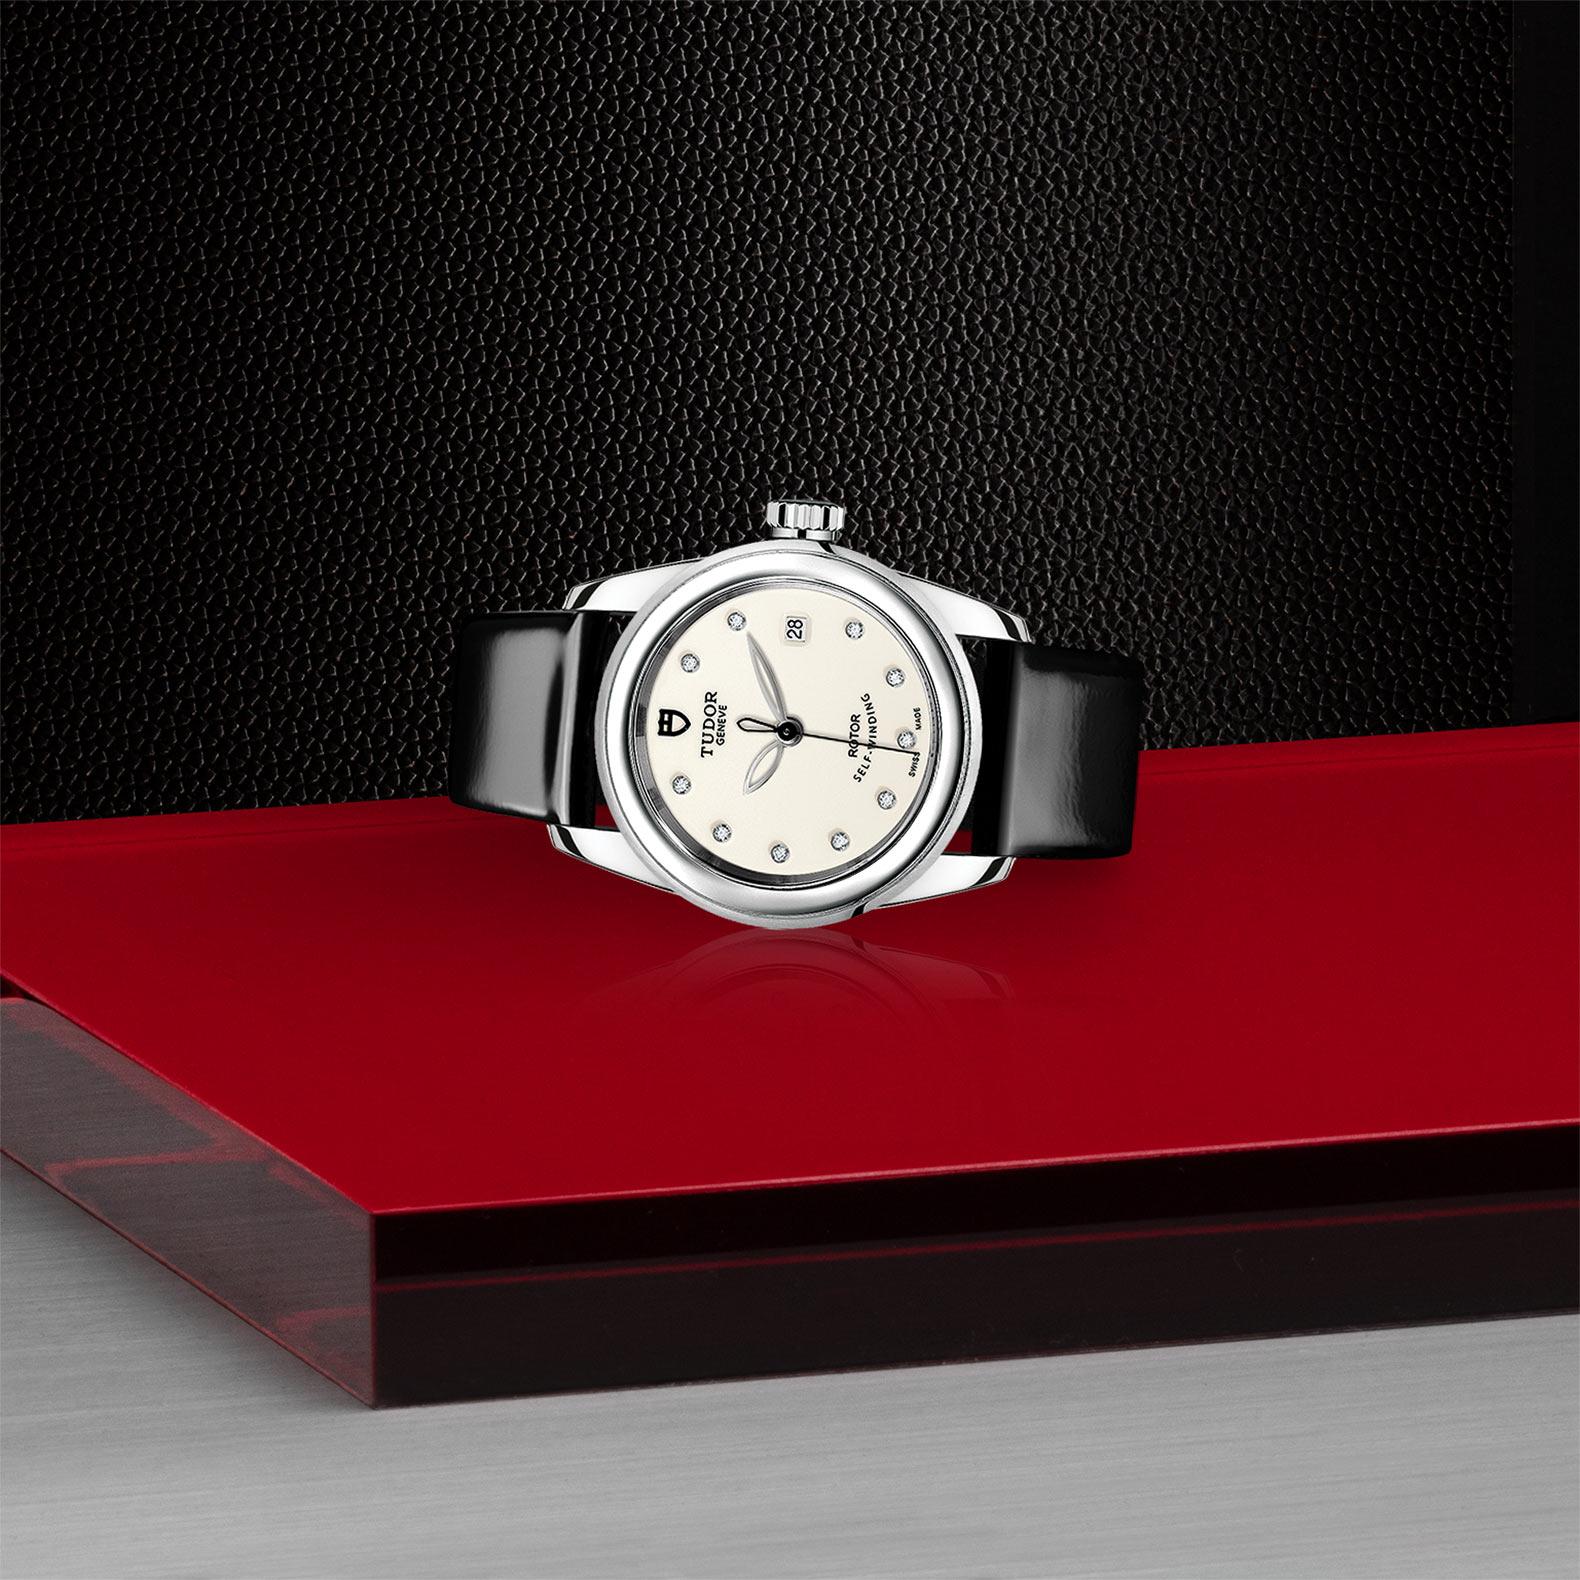 TUDOR Glamour Date M51000 0030 Layingdown